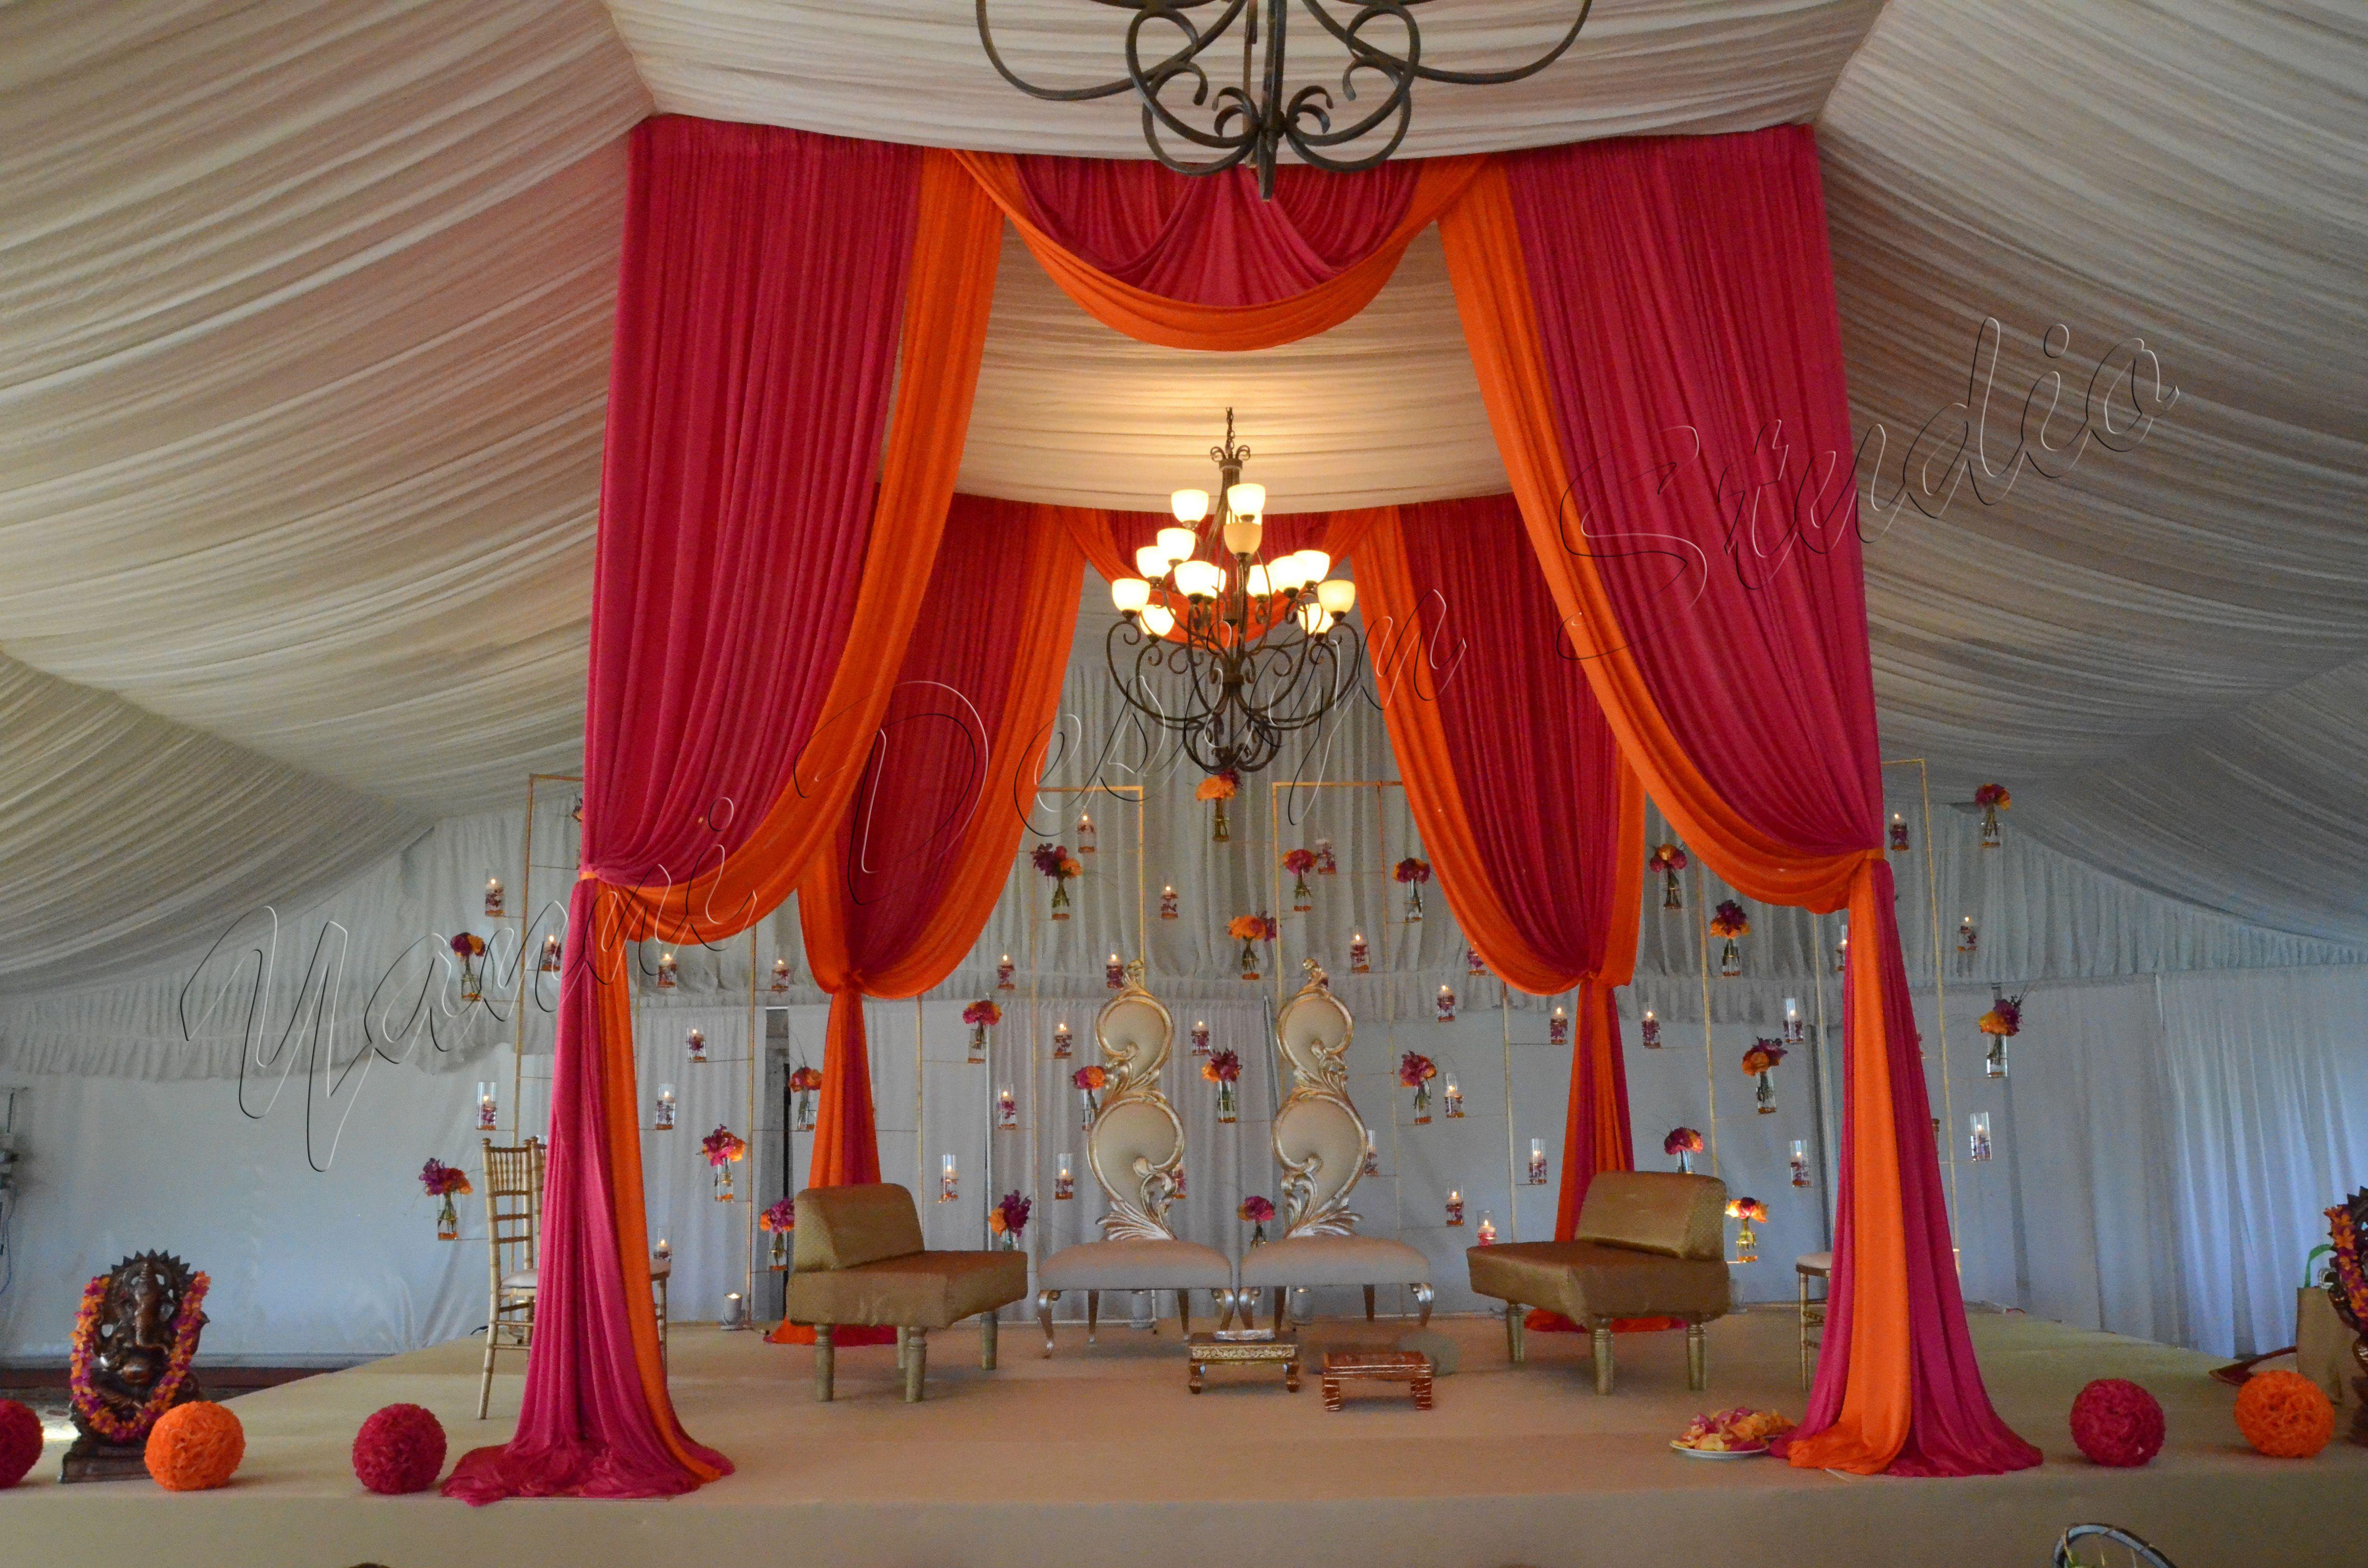 New wedding stage decoration  Indian wedding ceremony mandap Mandap with furniture  wedding